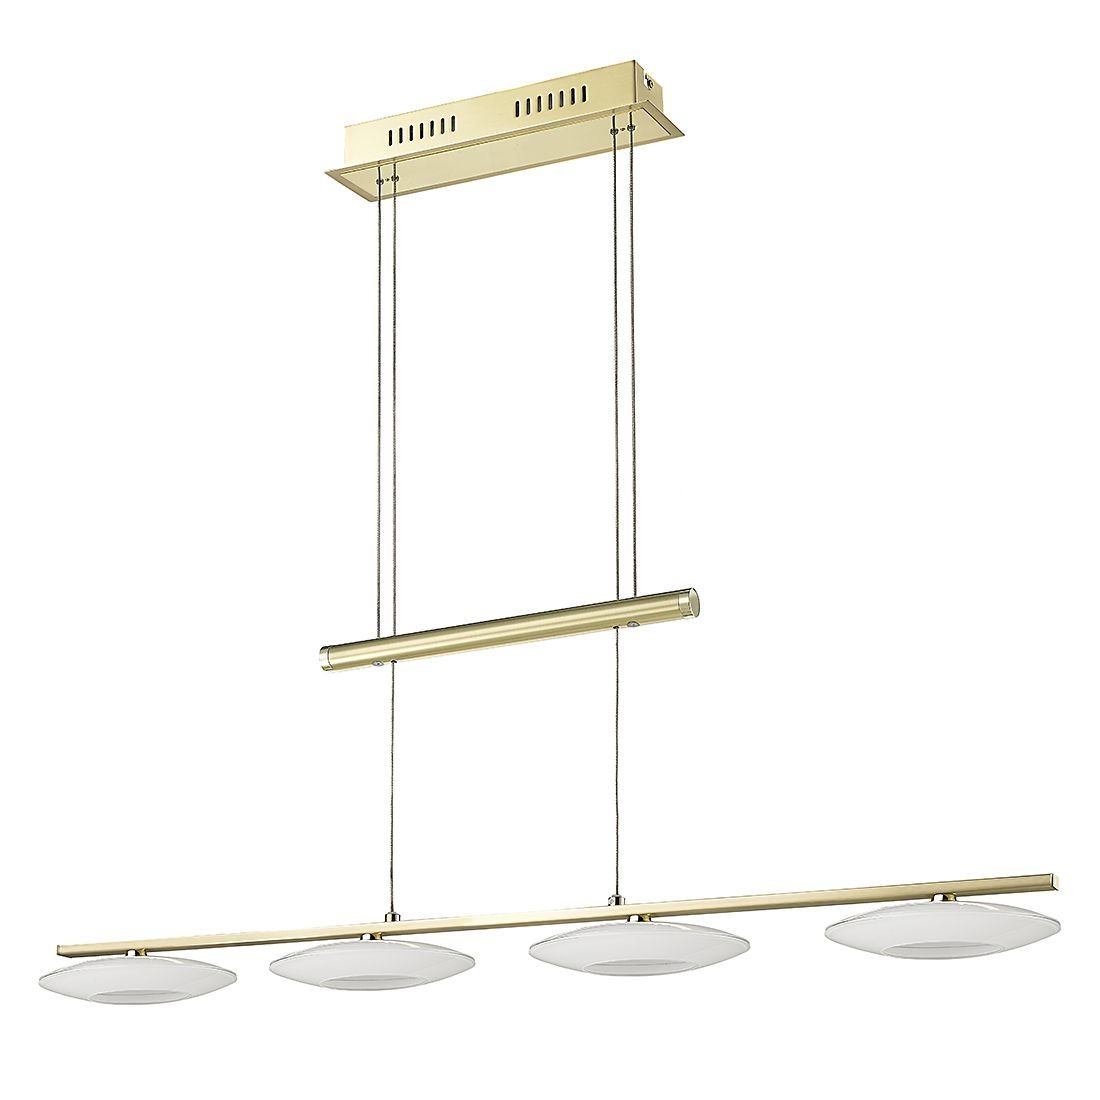 EEK A+, LED Pendelleuchte NEW Elina – Metall – 4-flammig, Sorpetaler günstig bestellen